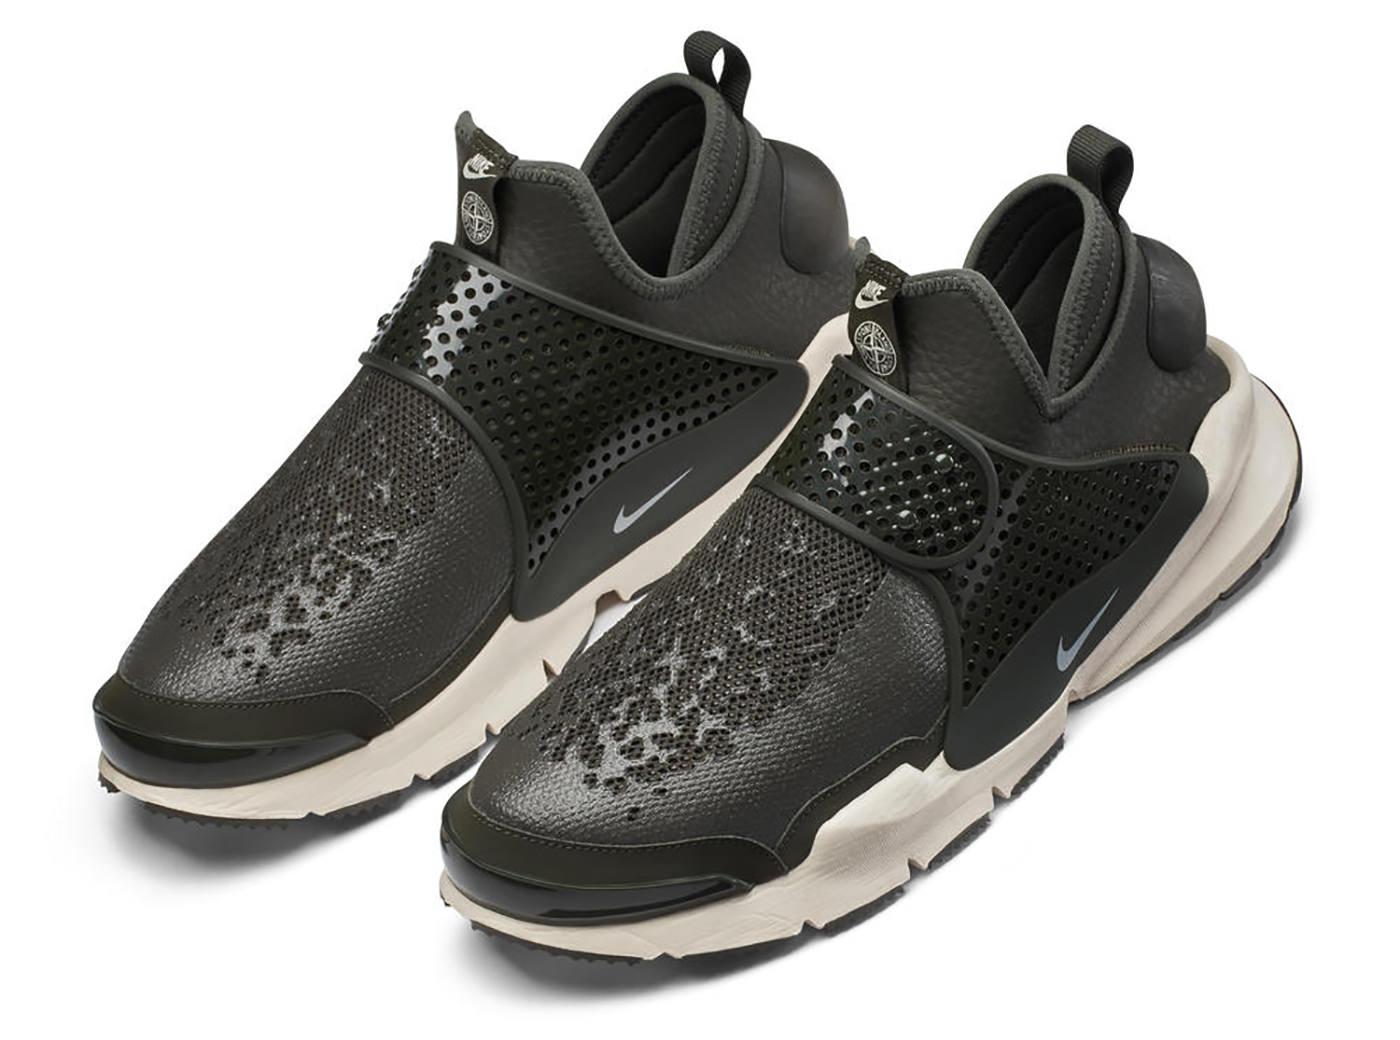 The_NikeLab_x_Stone_Island_Sock_Dart_Mid_6_hd_1600